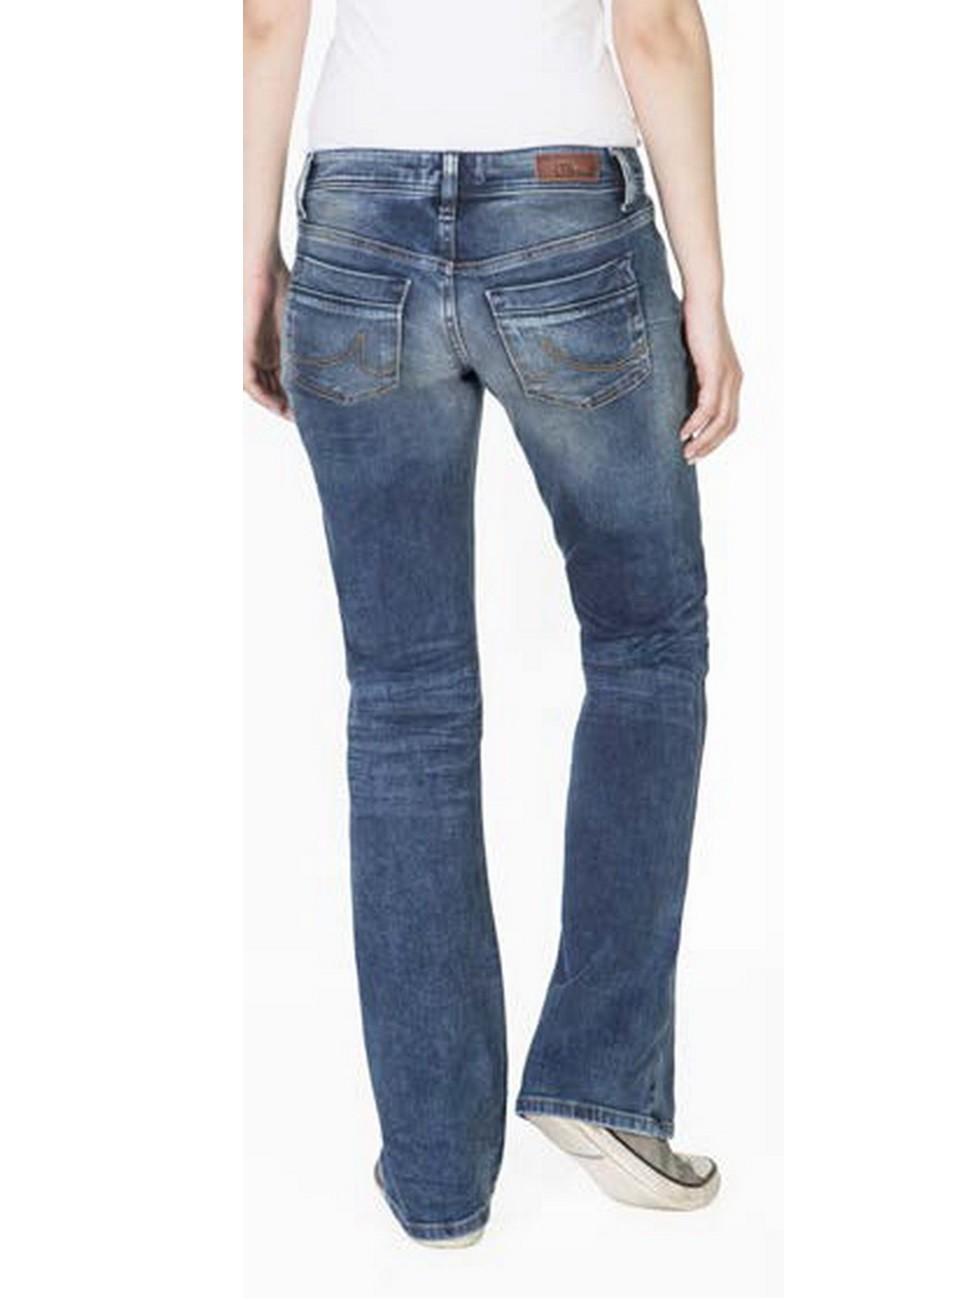 ltb damen jeans valerie bootcut roswell wash kaufen jeans direct de. Black Bedroom Furniture Sets. Home Design Ideas